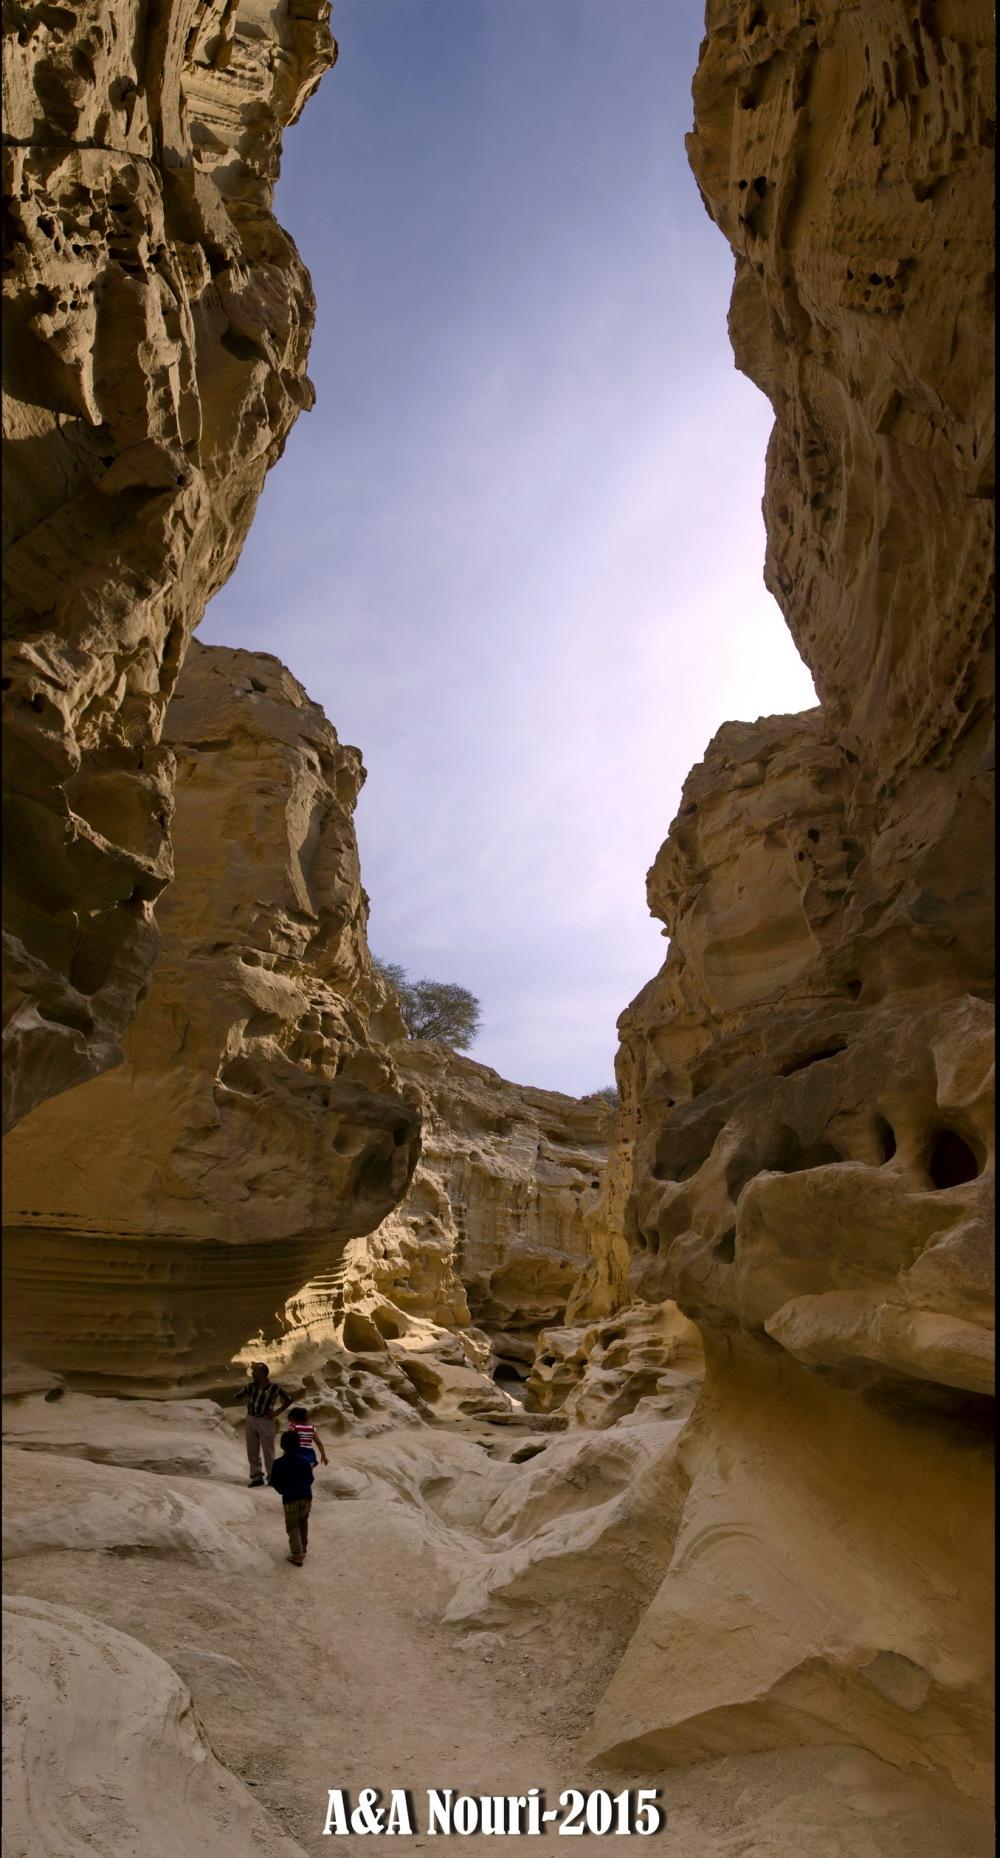 chahkouh strange valley